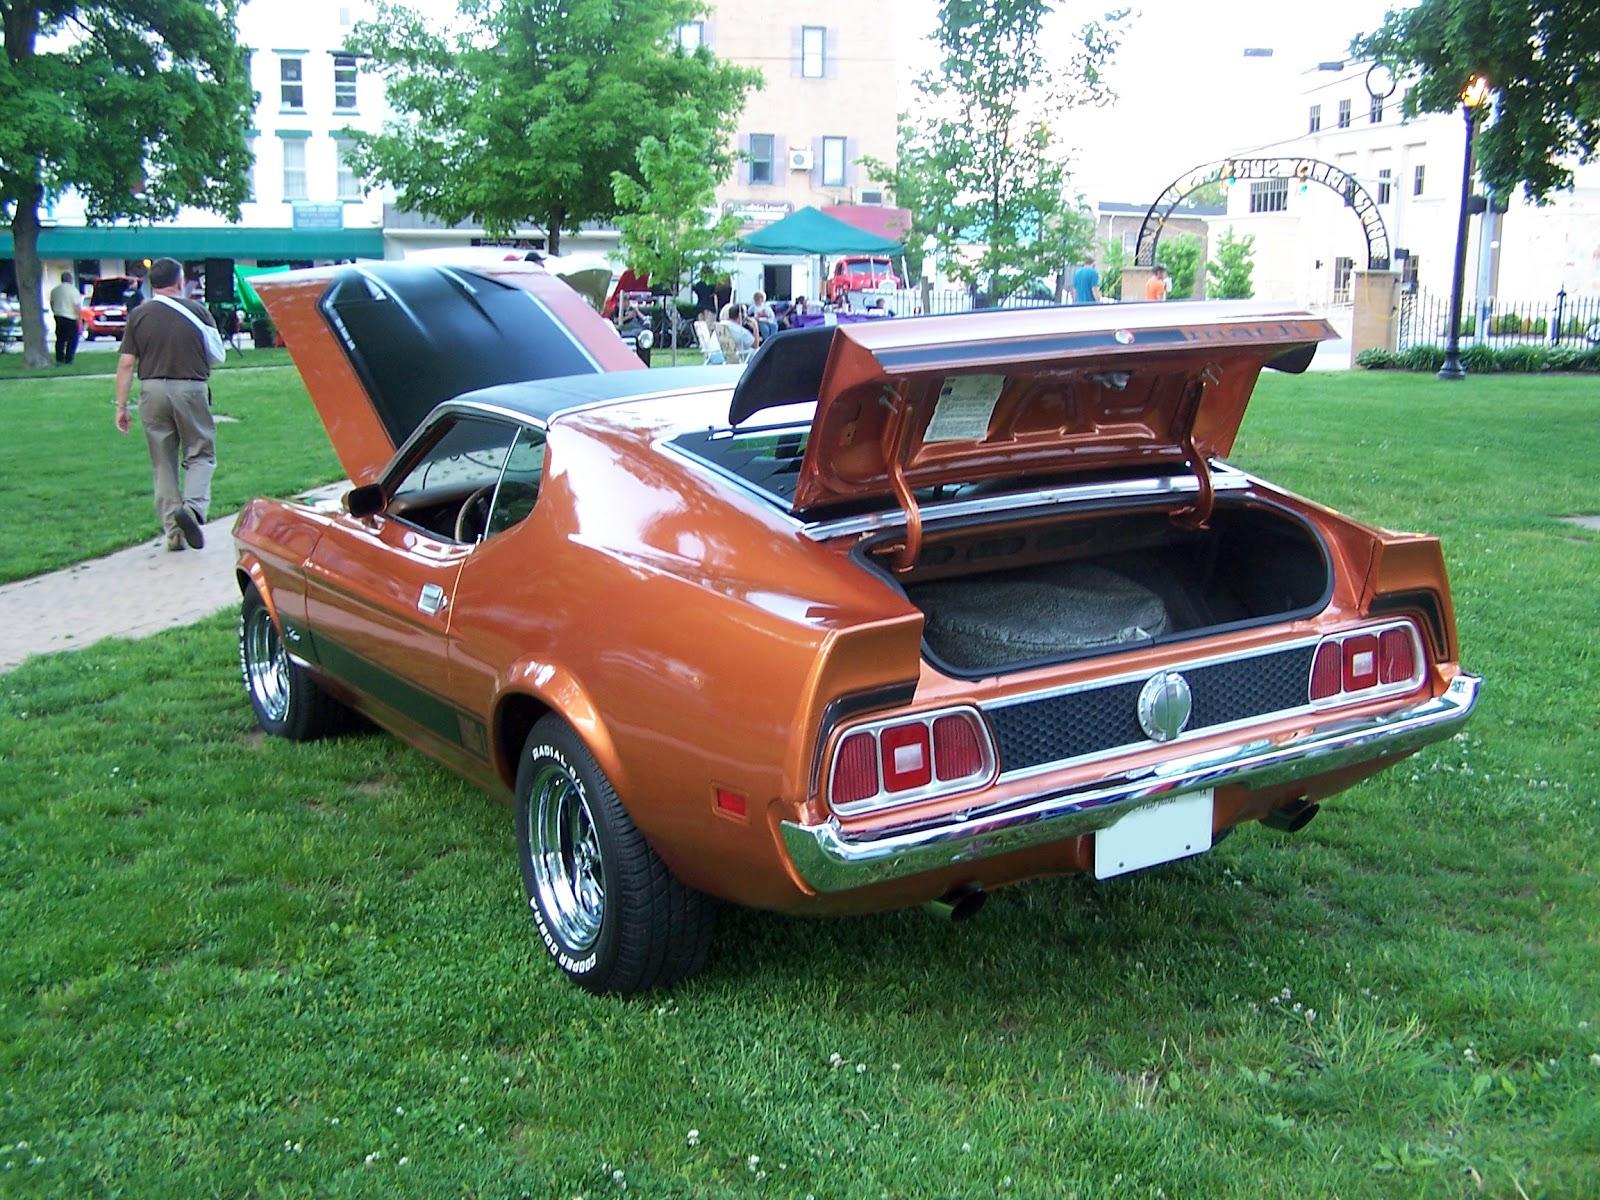 73 Mach 1 Wiring Diagram Library 1966 Mustang Convertible Customer Cars And 66